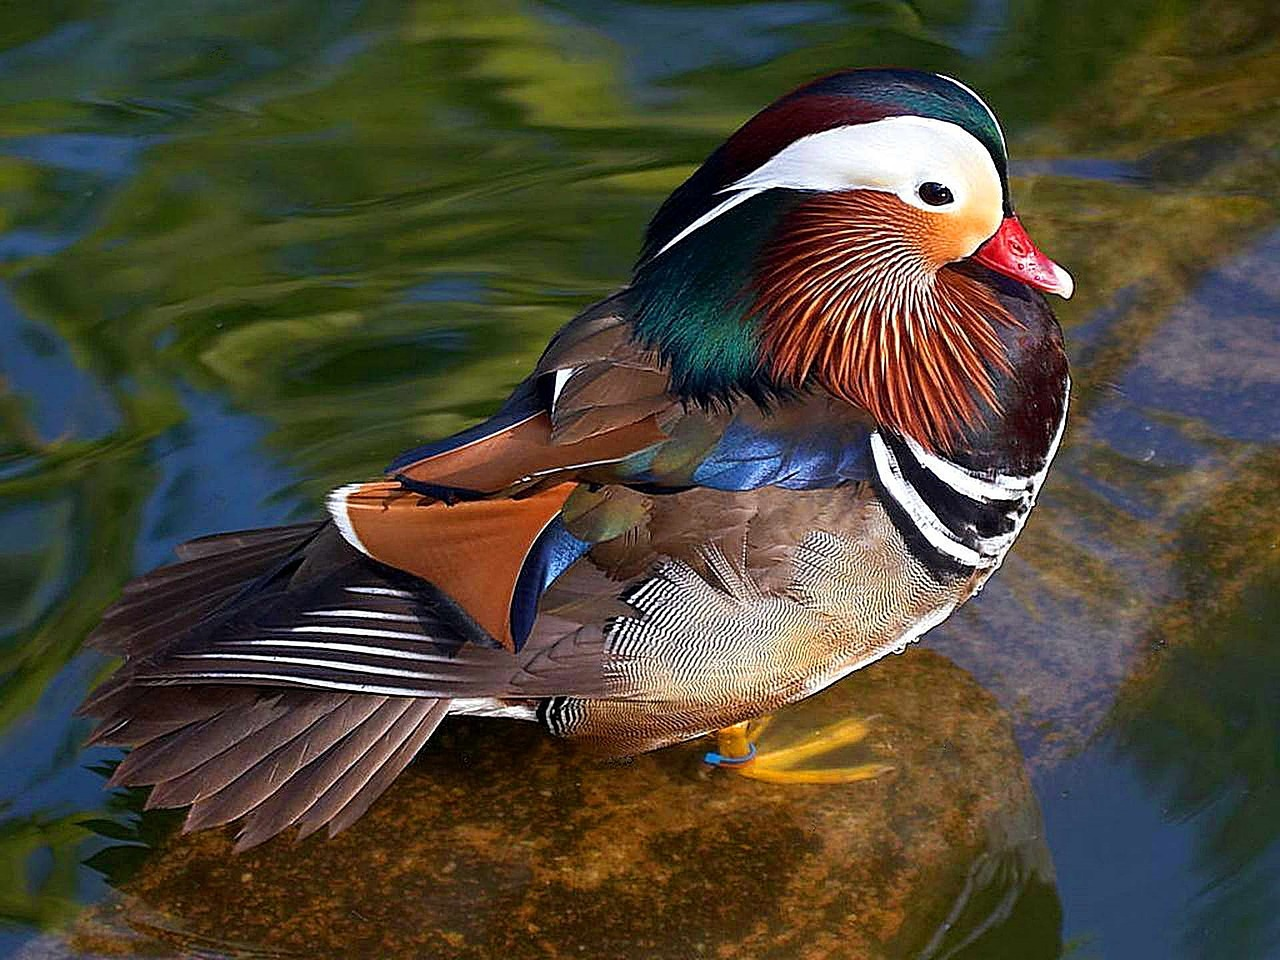 mandarin-duck-2011101_1280